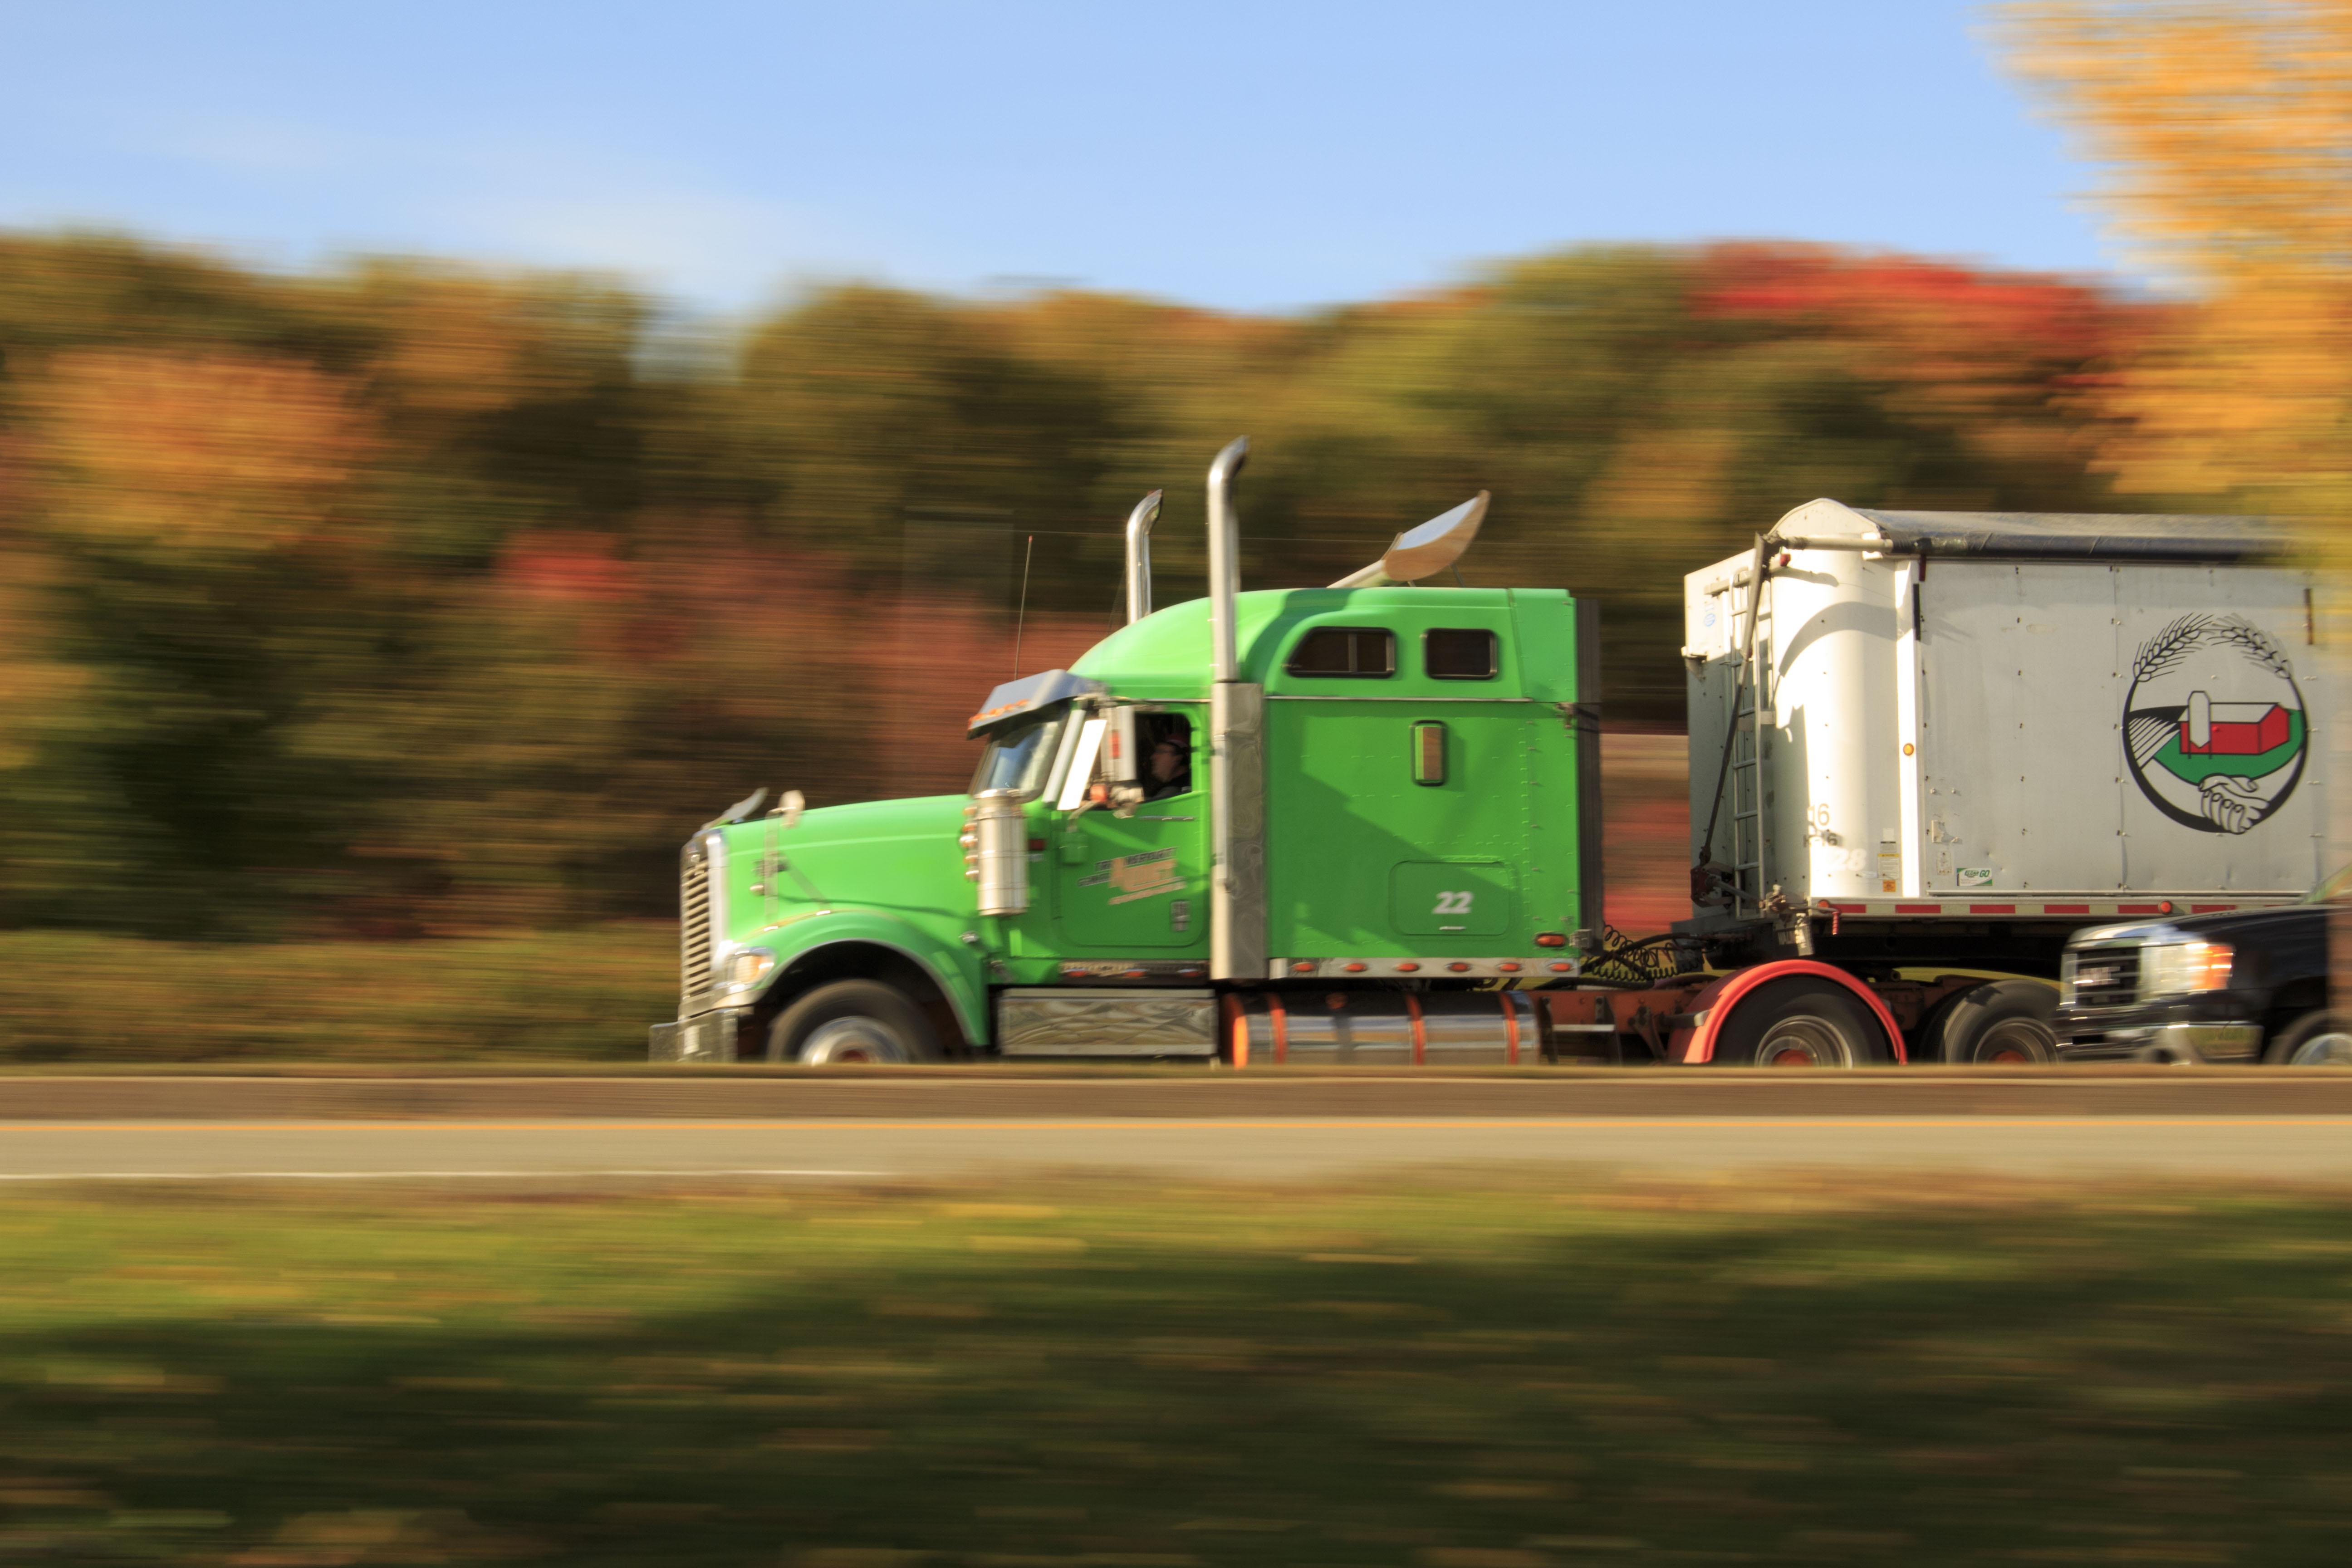 https://www.pexels.com/photo/action-automotive-cargo-container-diesel-590839/